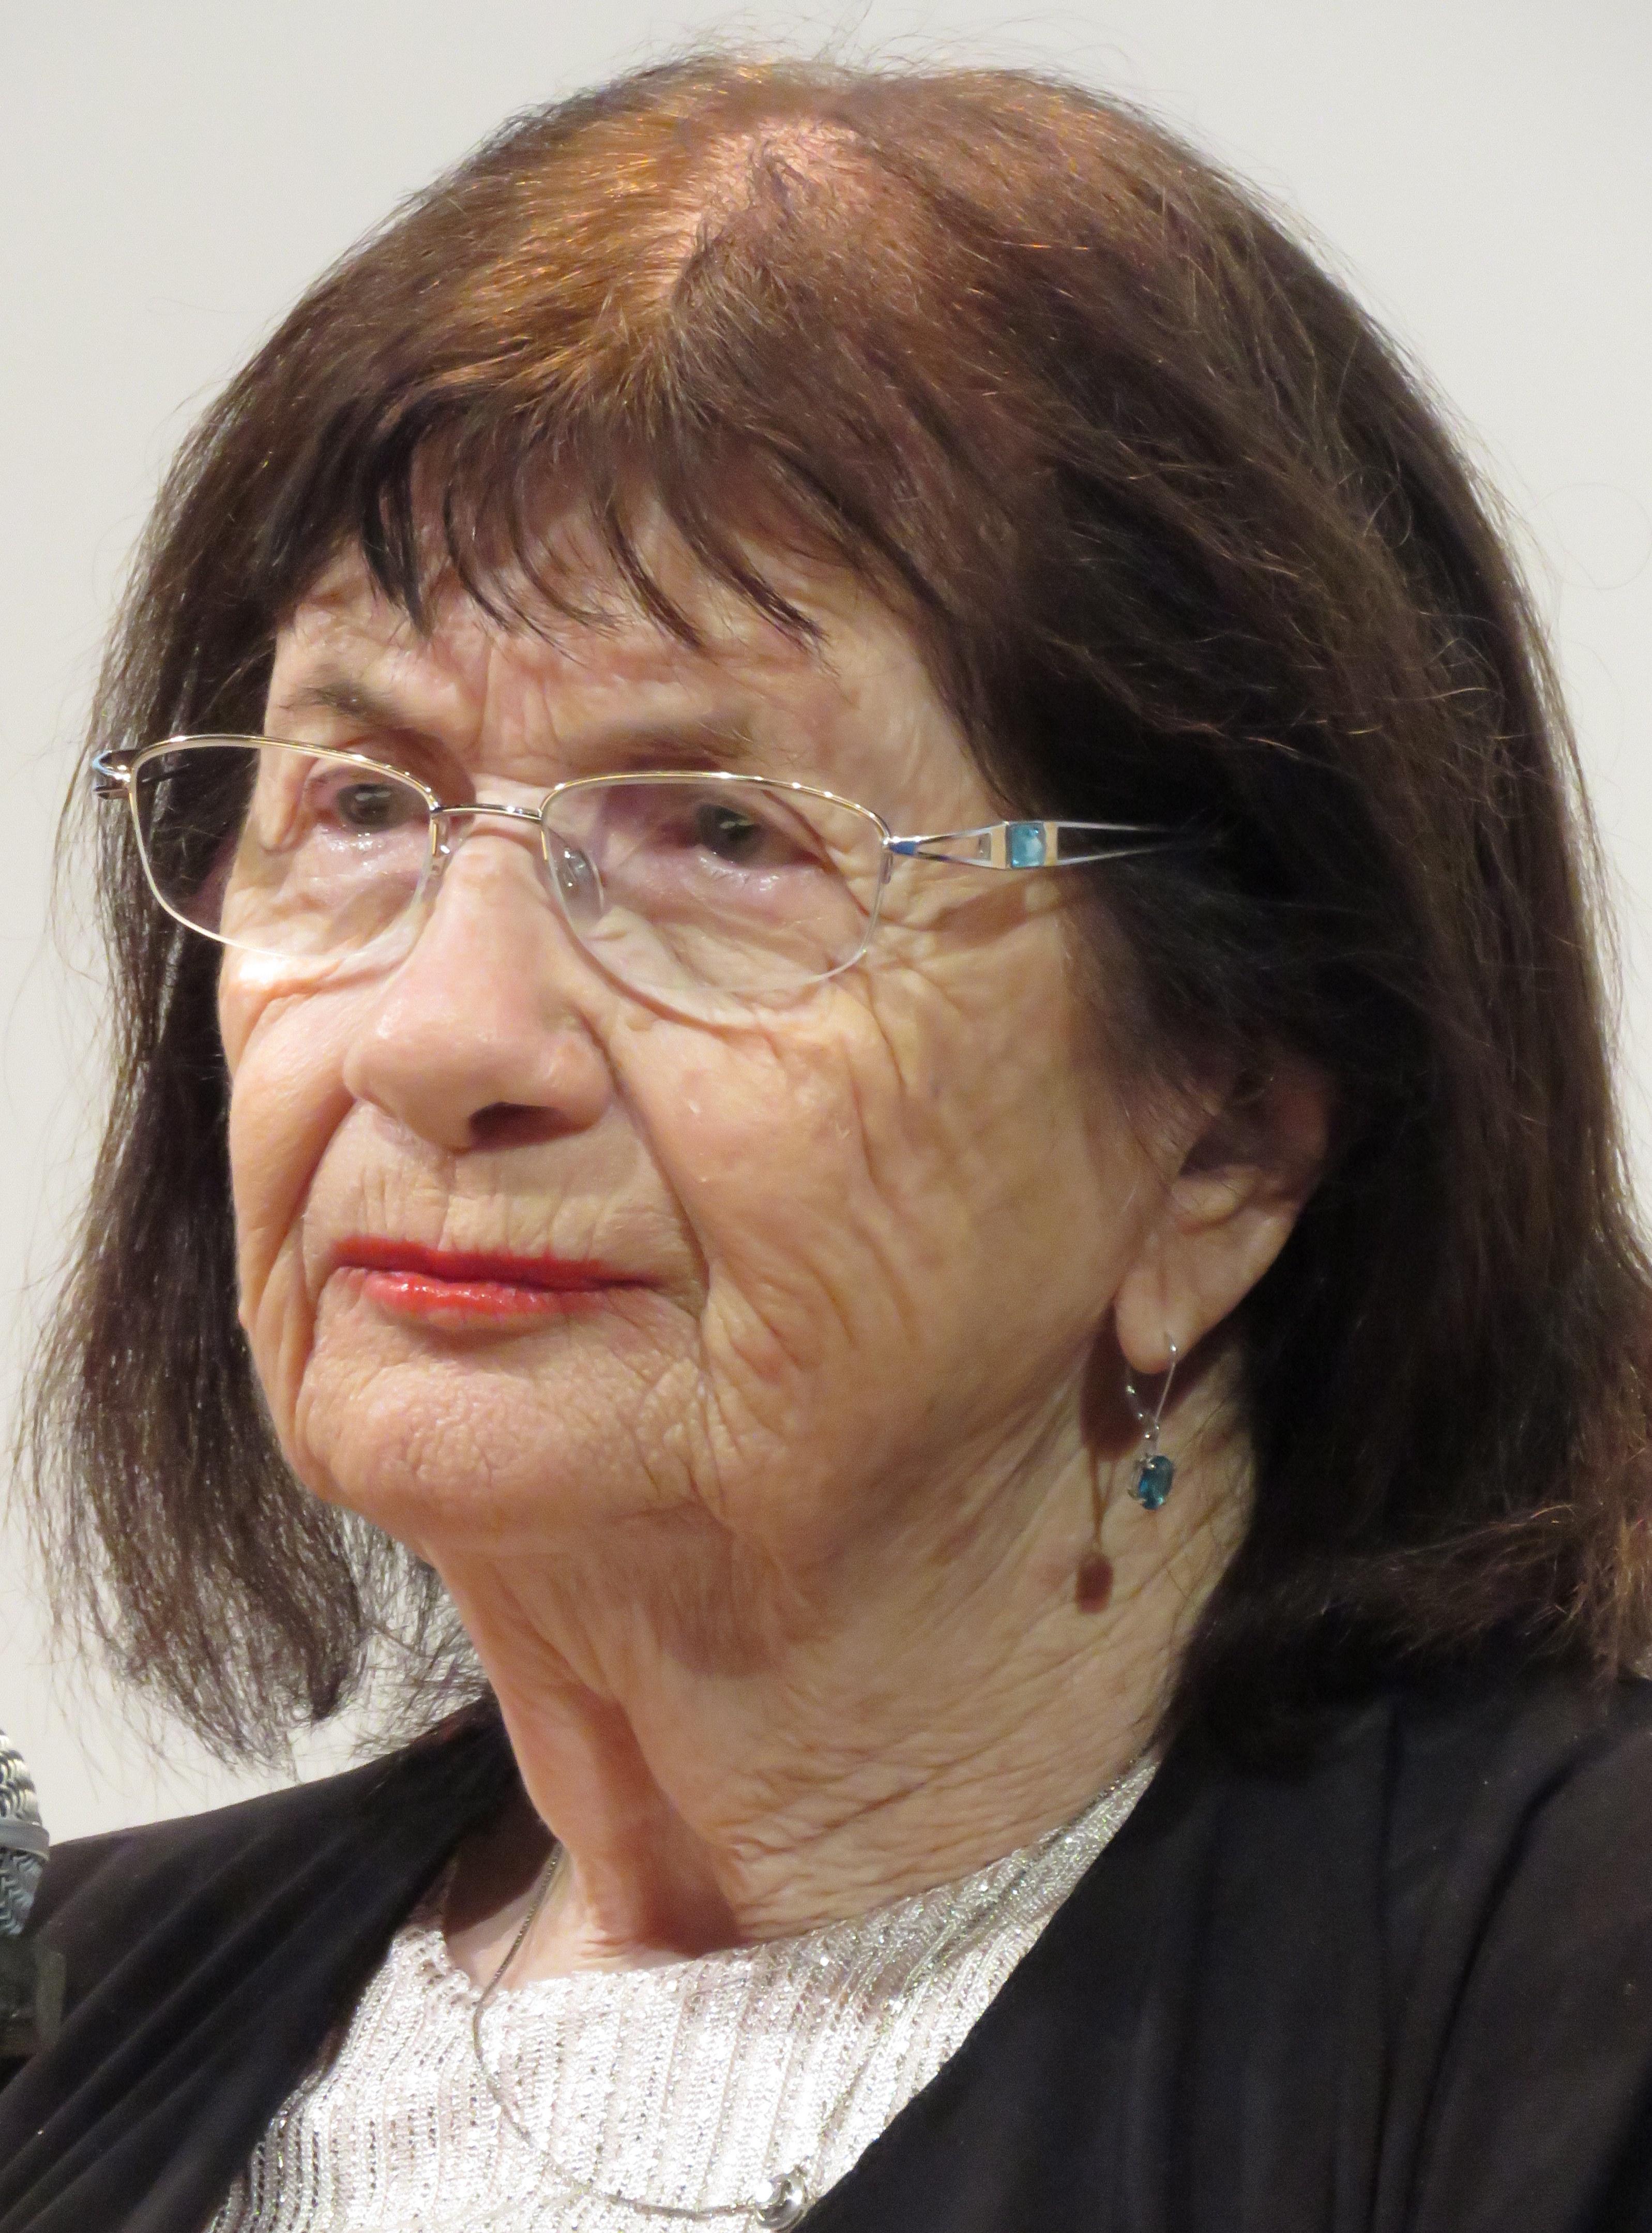 Halina Birenbaum (2019)